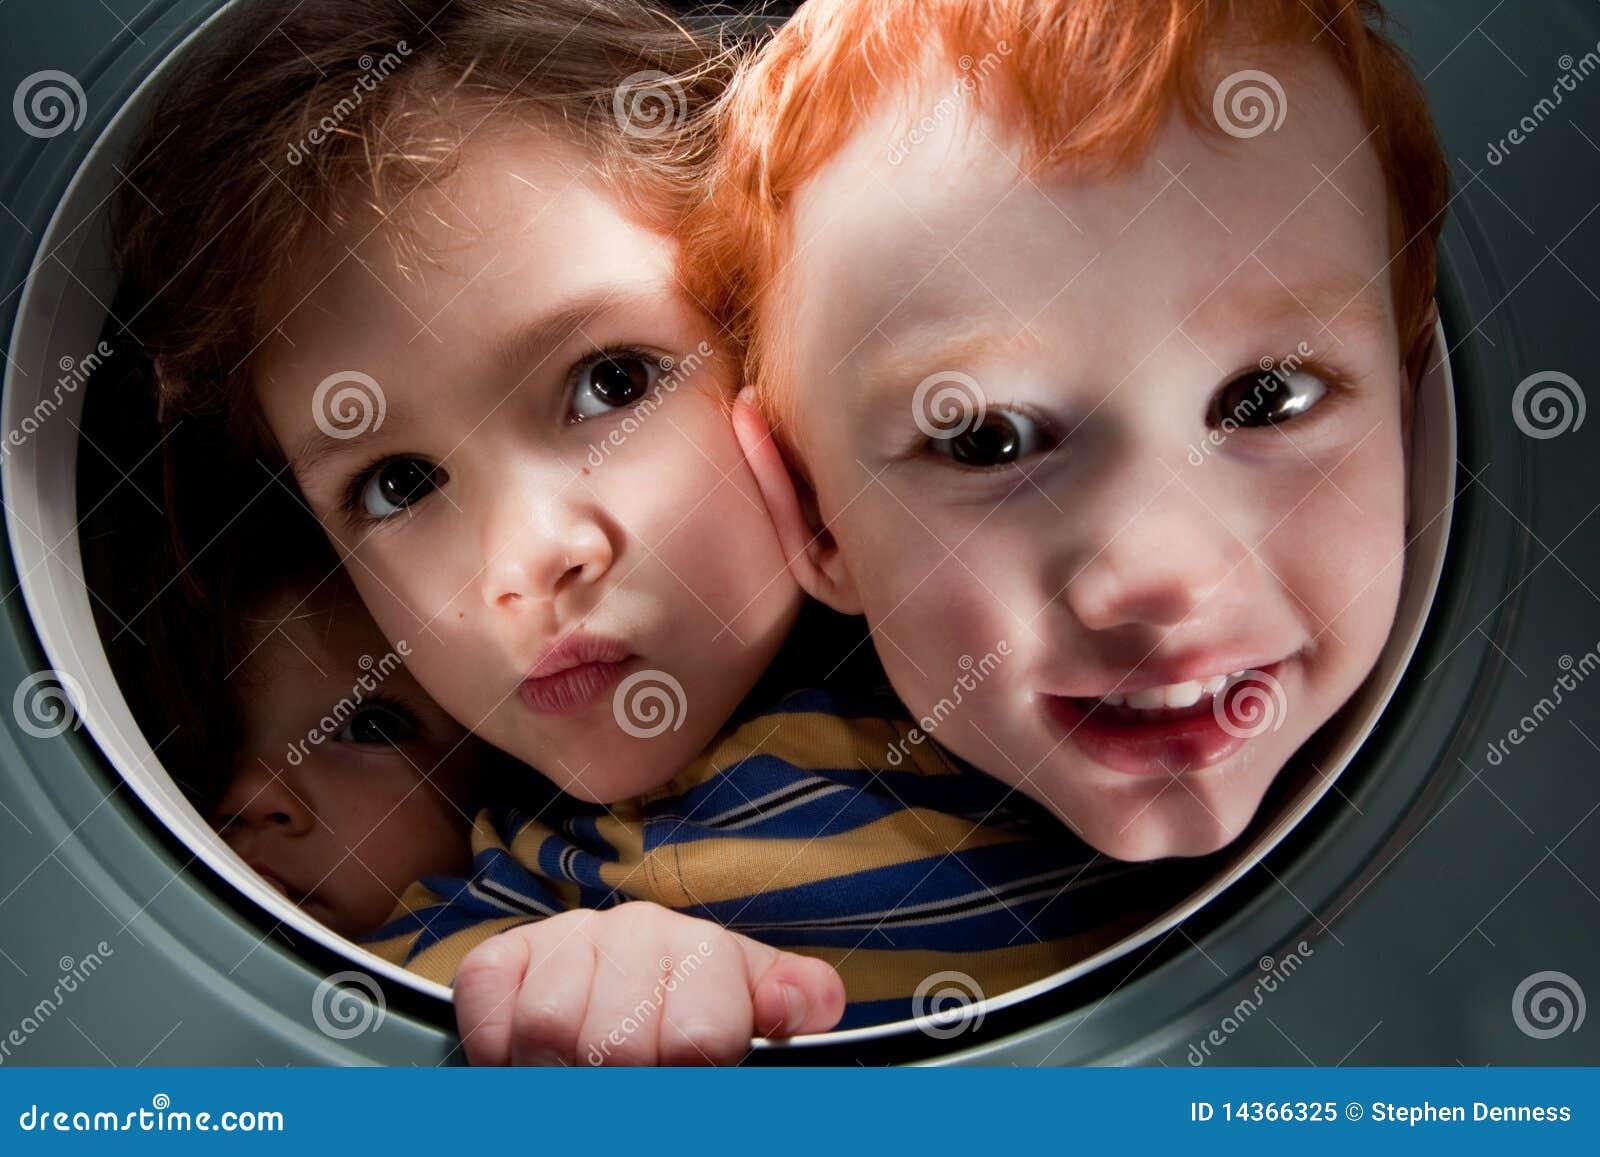 kid pix free download for windows